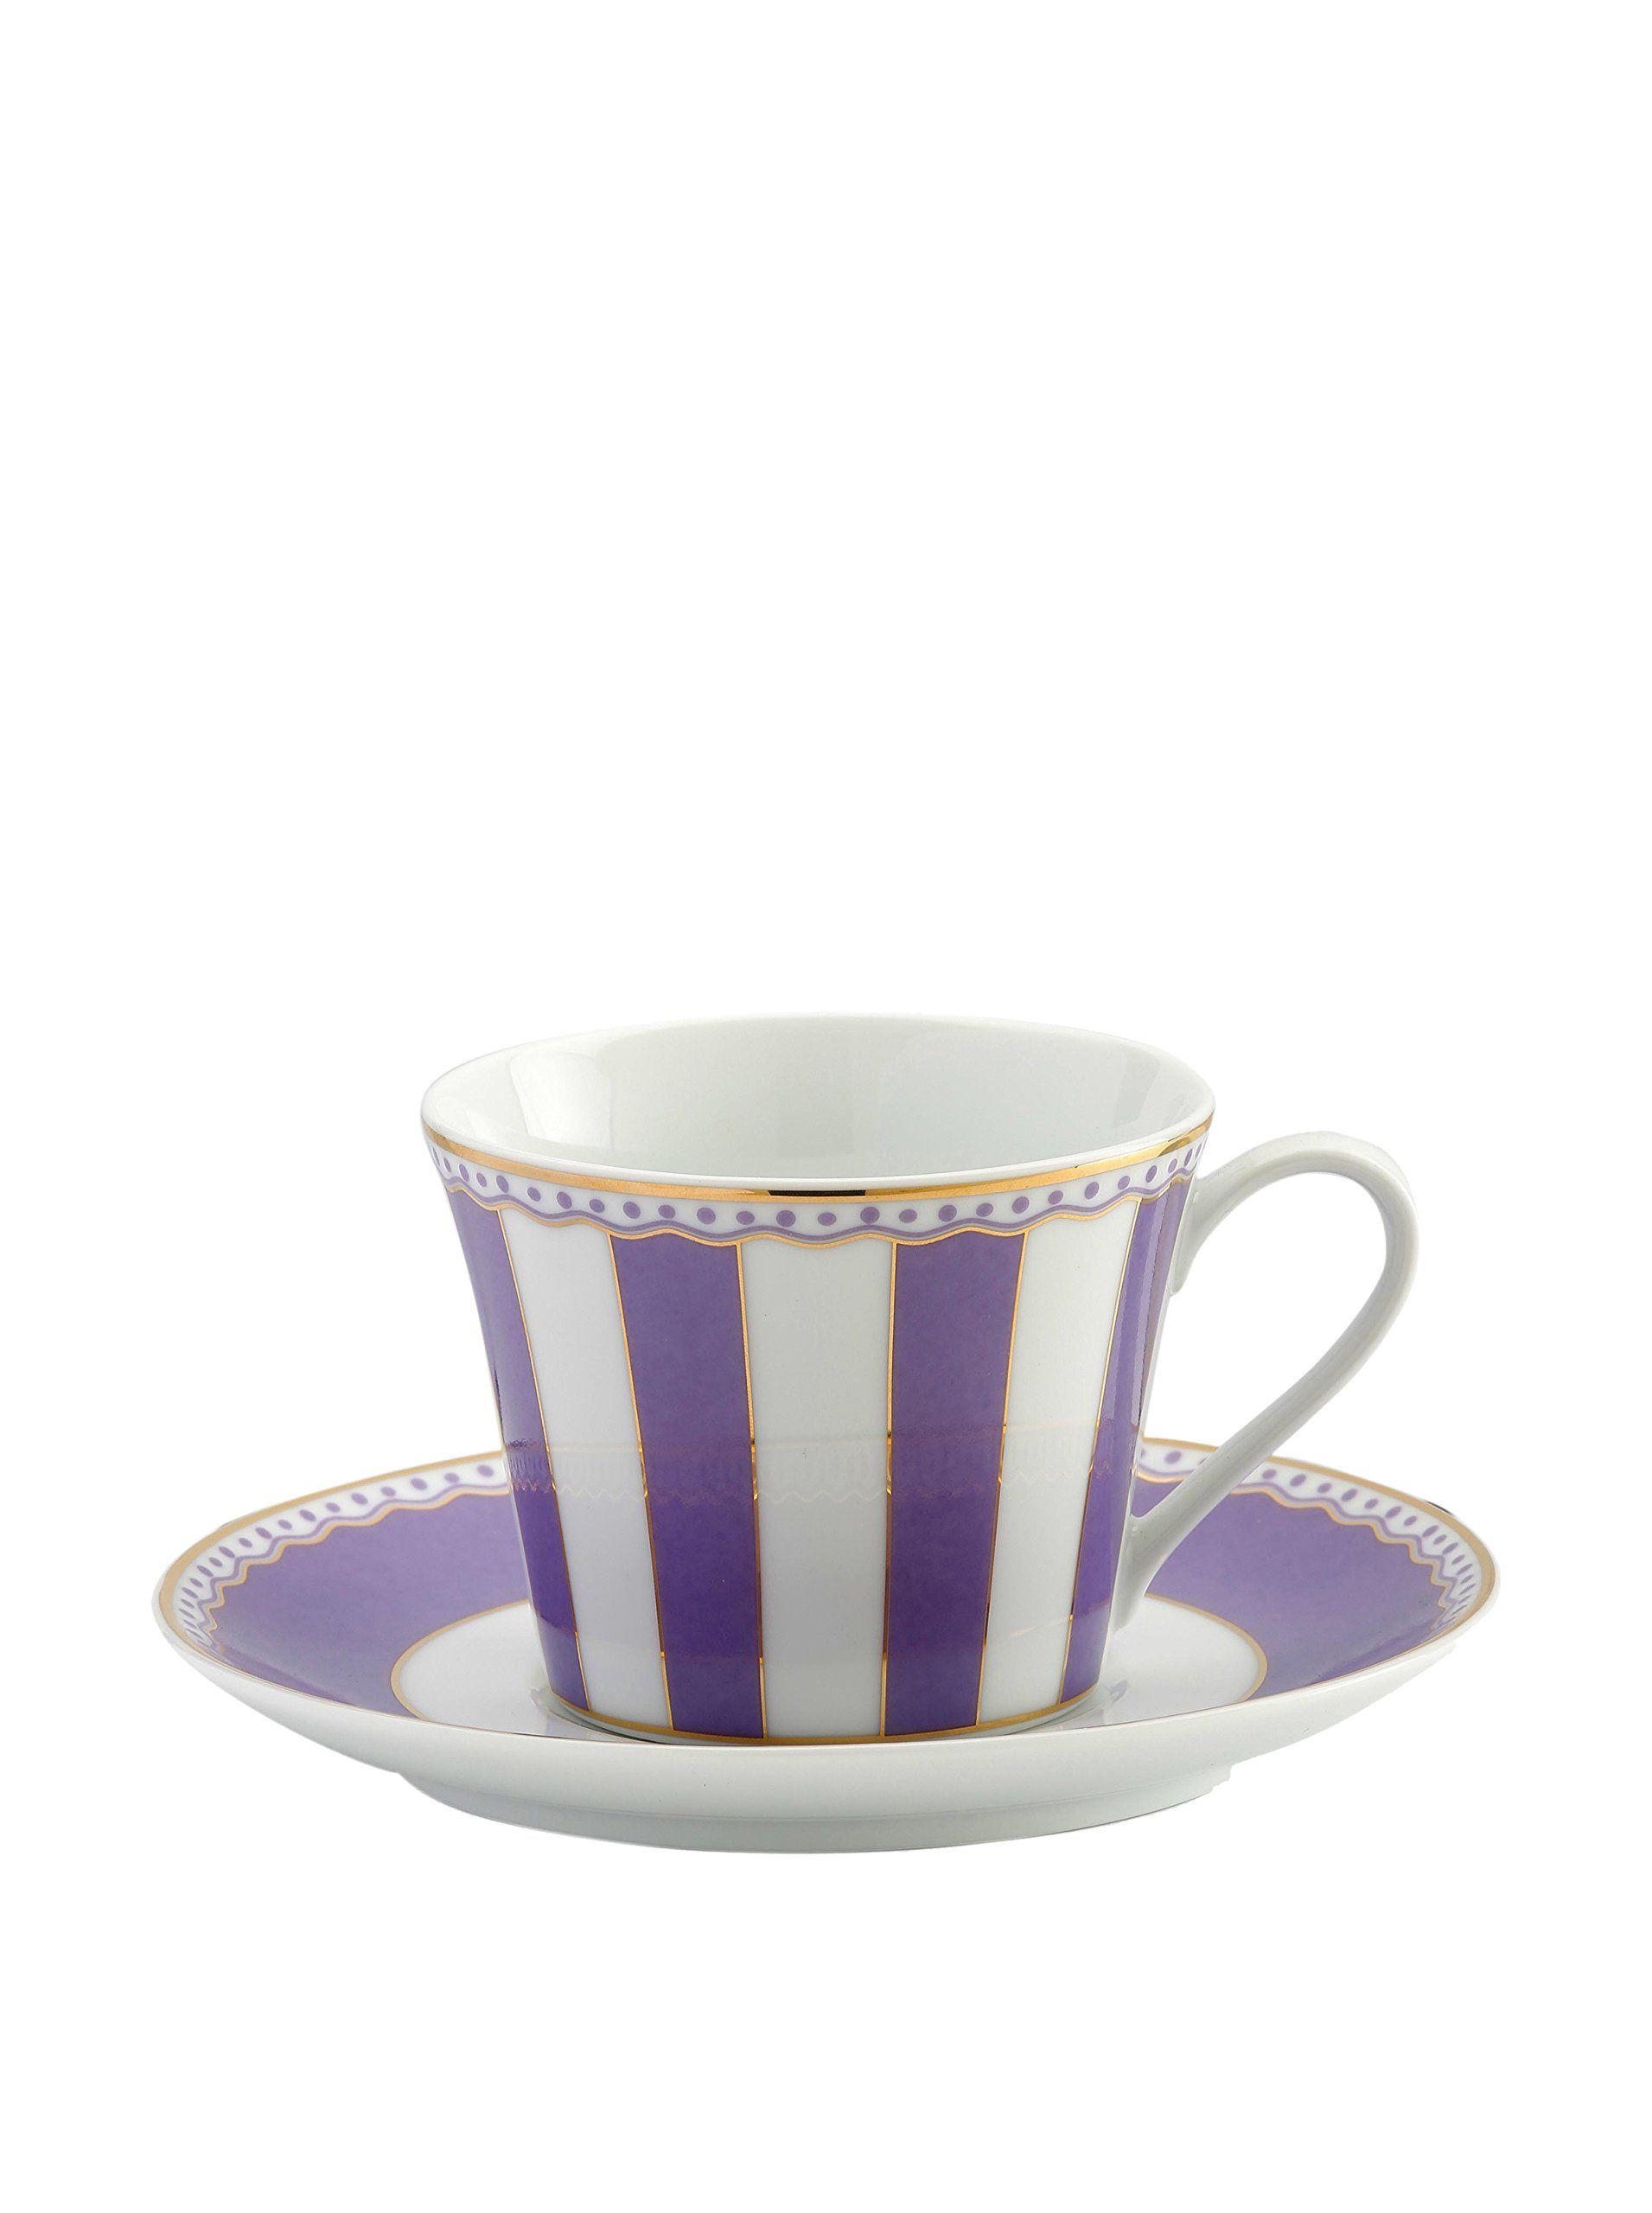 Noritake Carnivale 8-Oz. Cup & Saucer, White/Lavender at MYHABIT